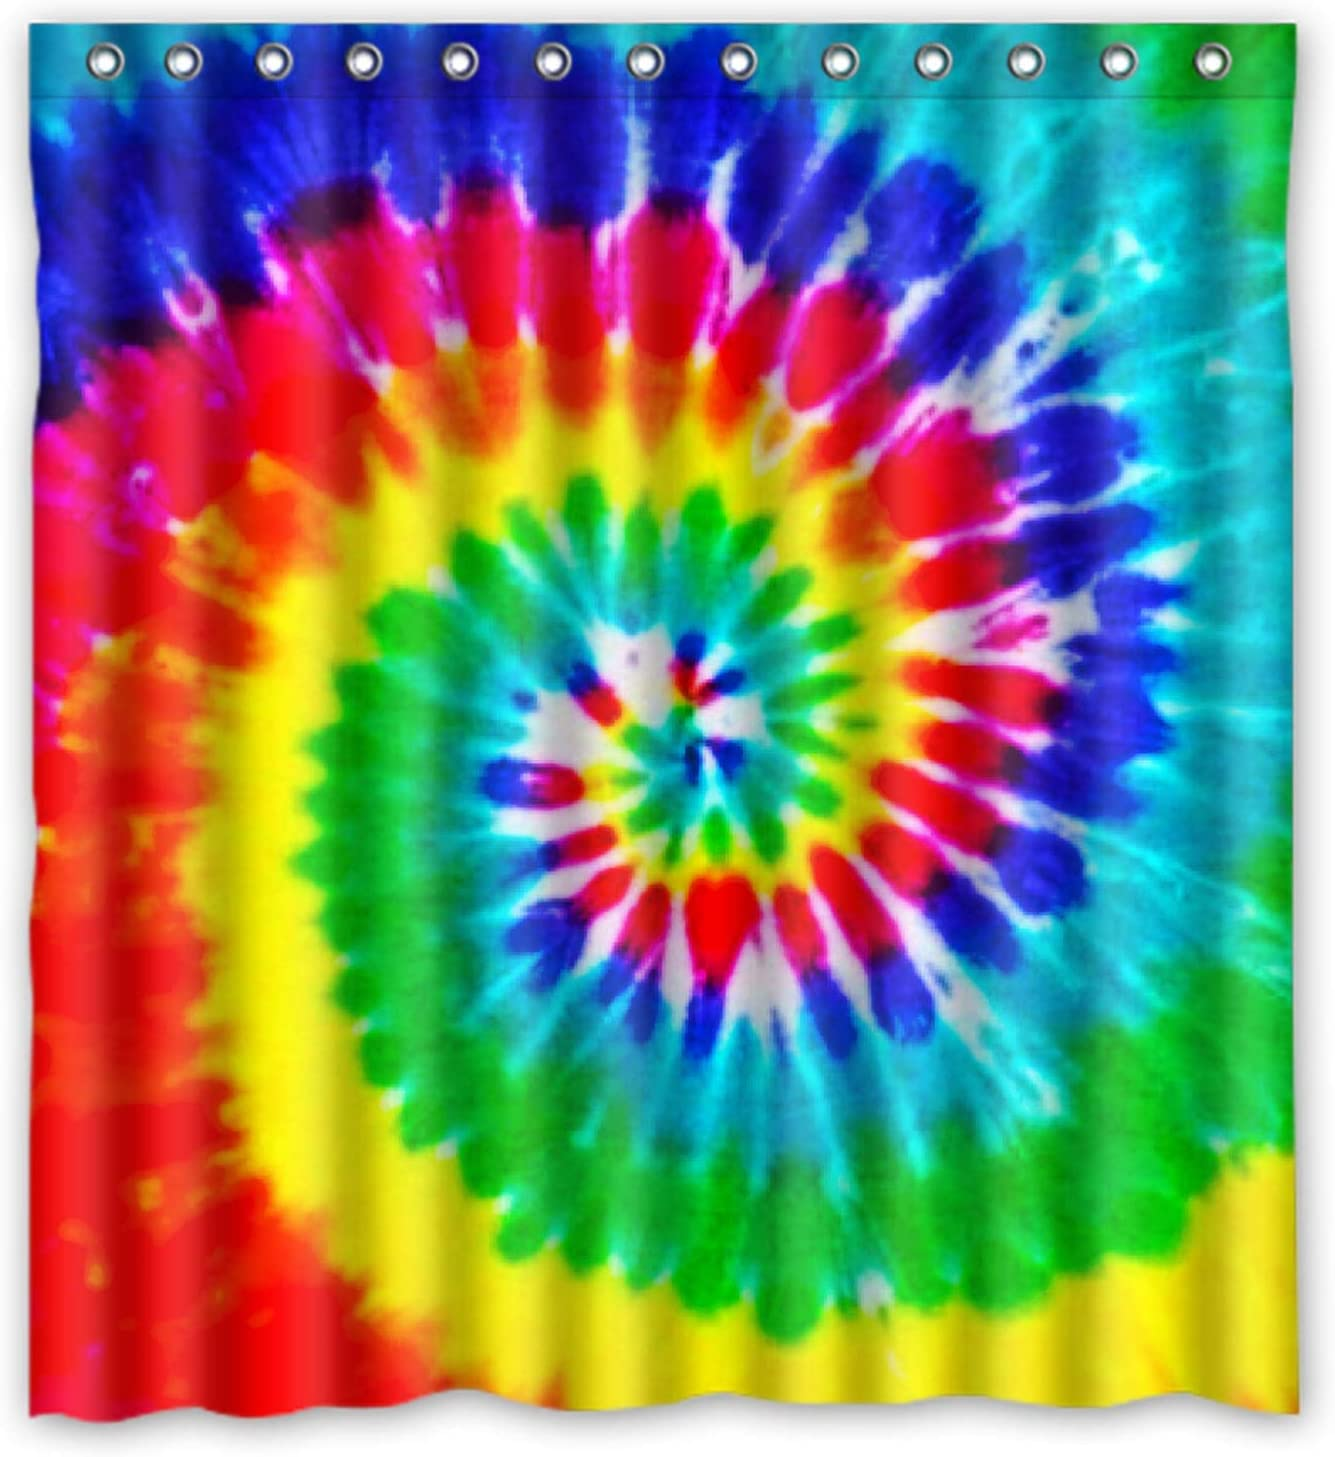 12 COLORFUL~SHOWER CURTAIN~HOOKS Retro~PEACE sign~Red~green~orange~purple LOVE